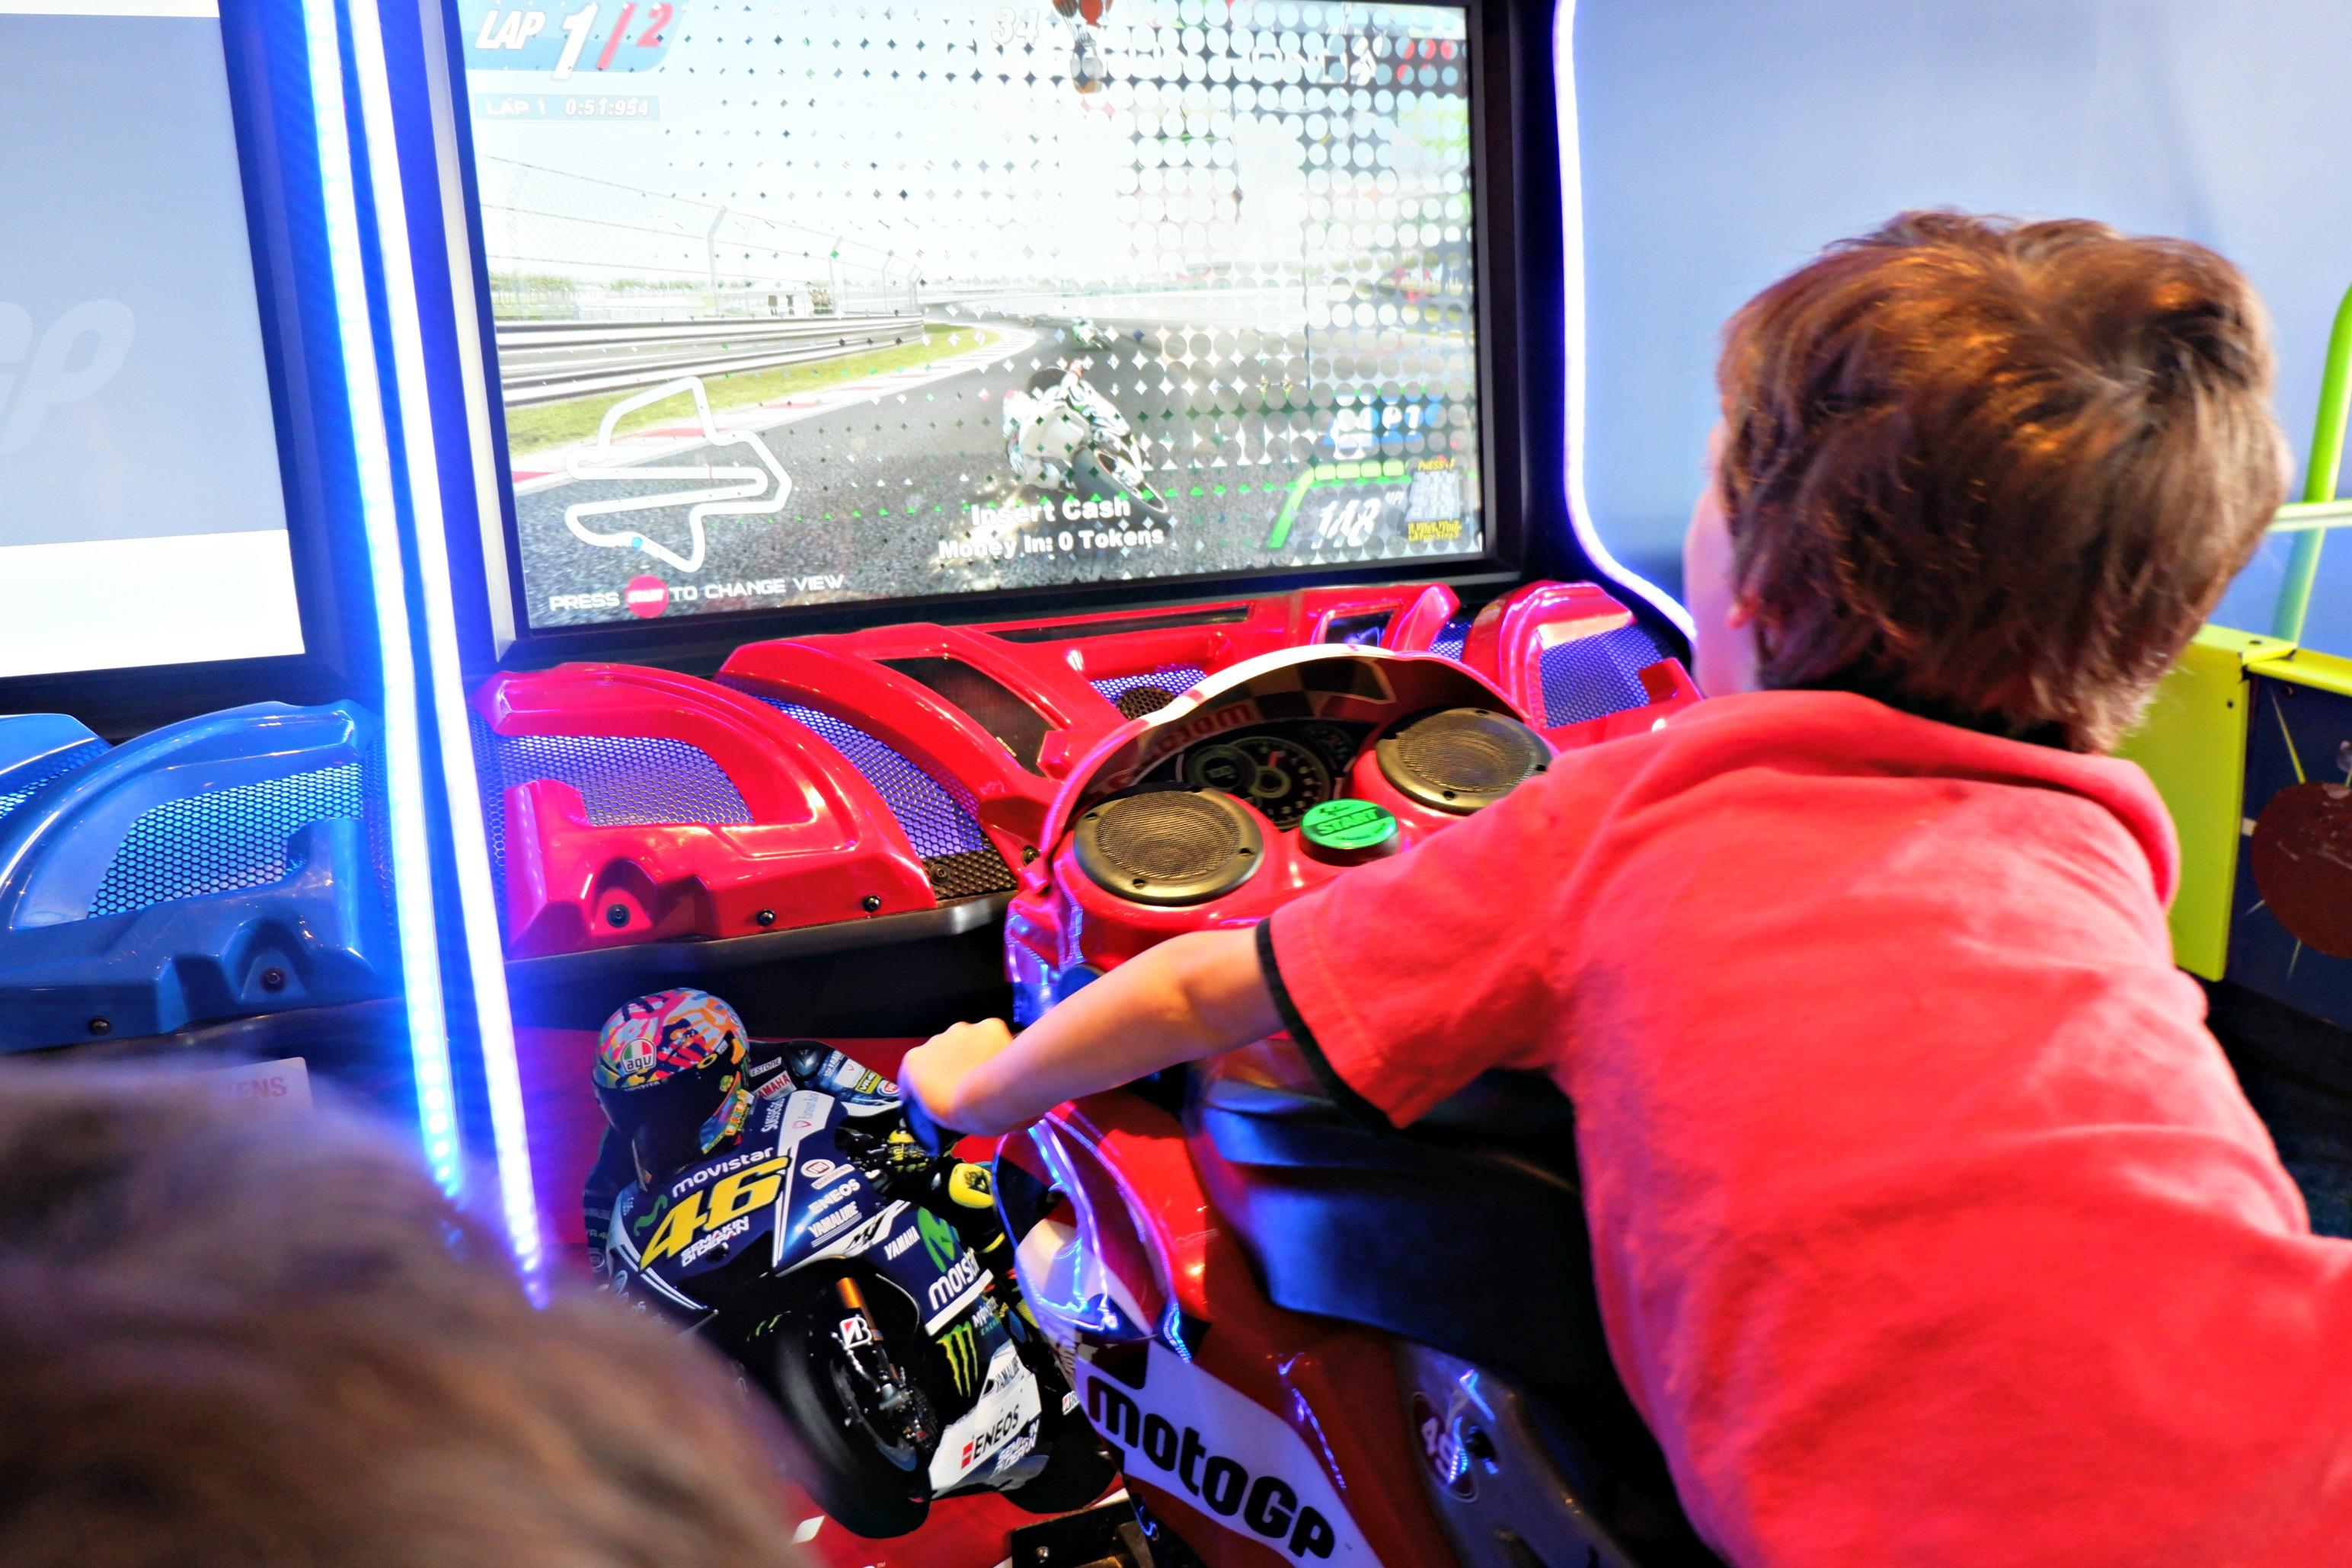 arcades moncton riverview dieppe indoor fun race car game